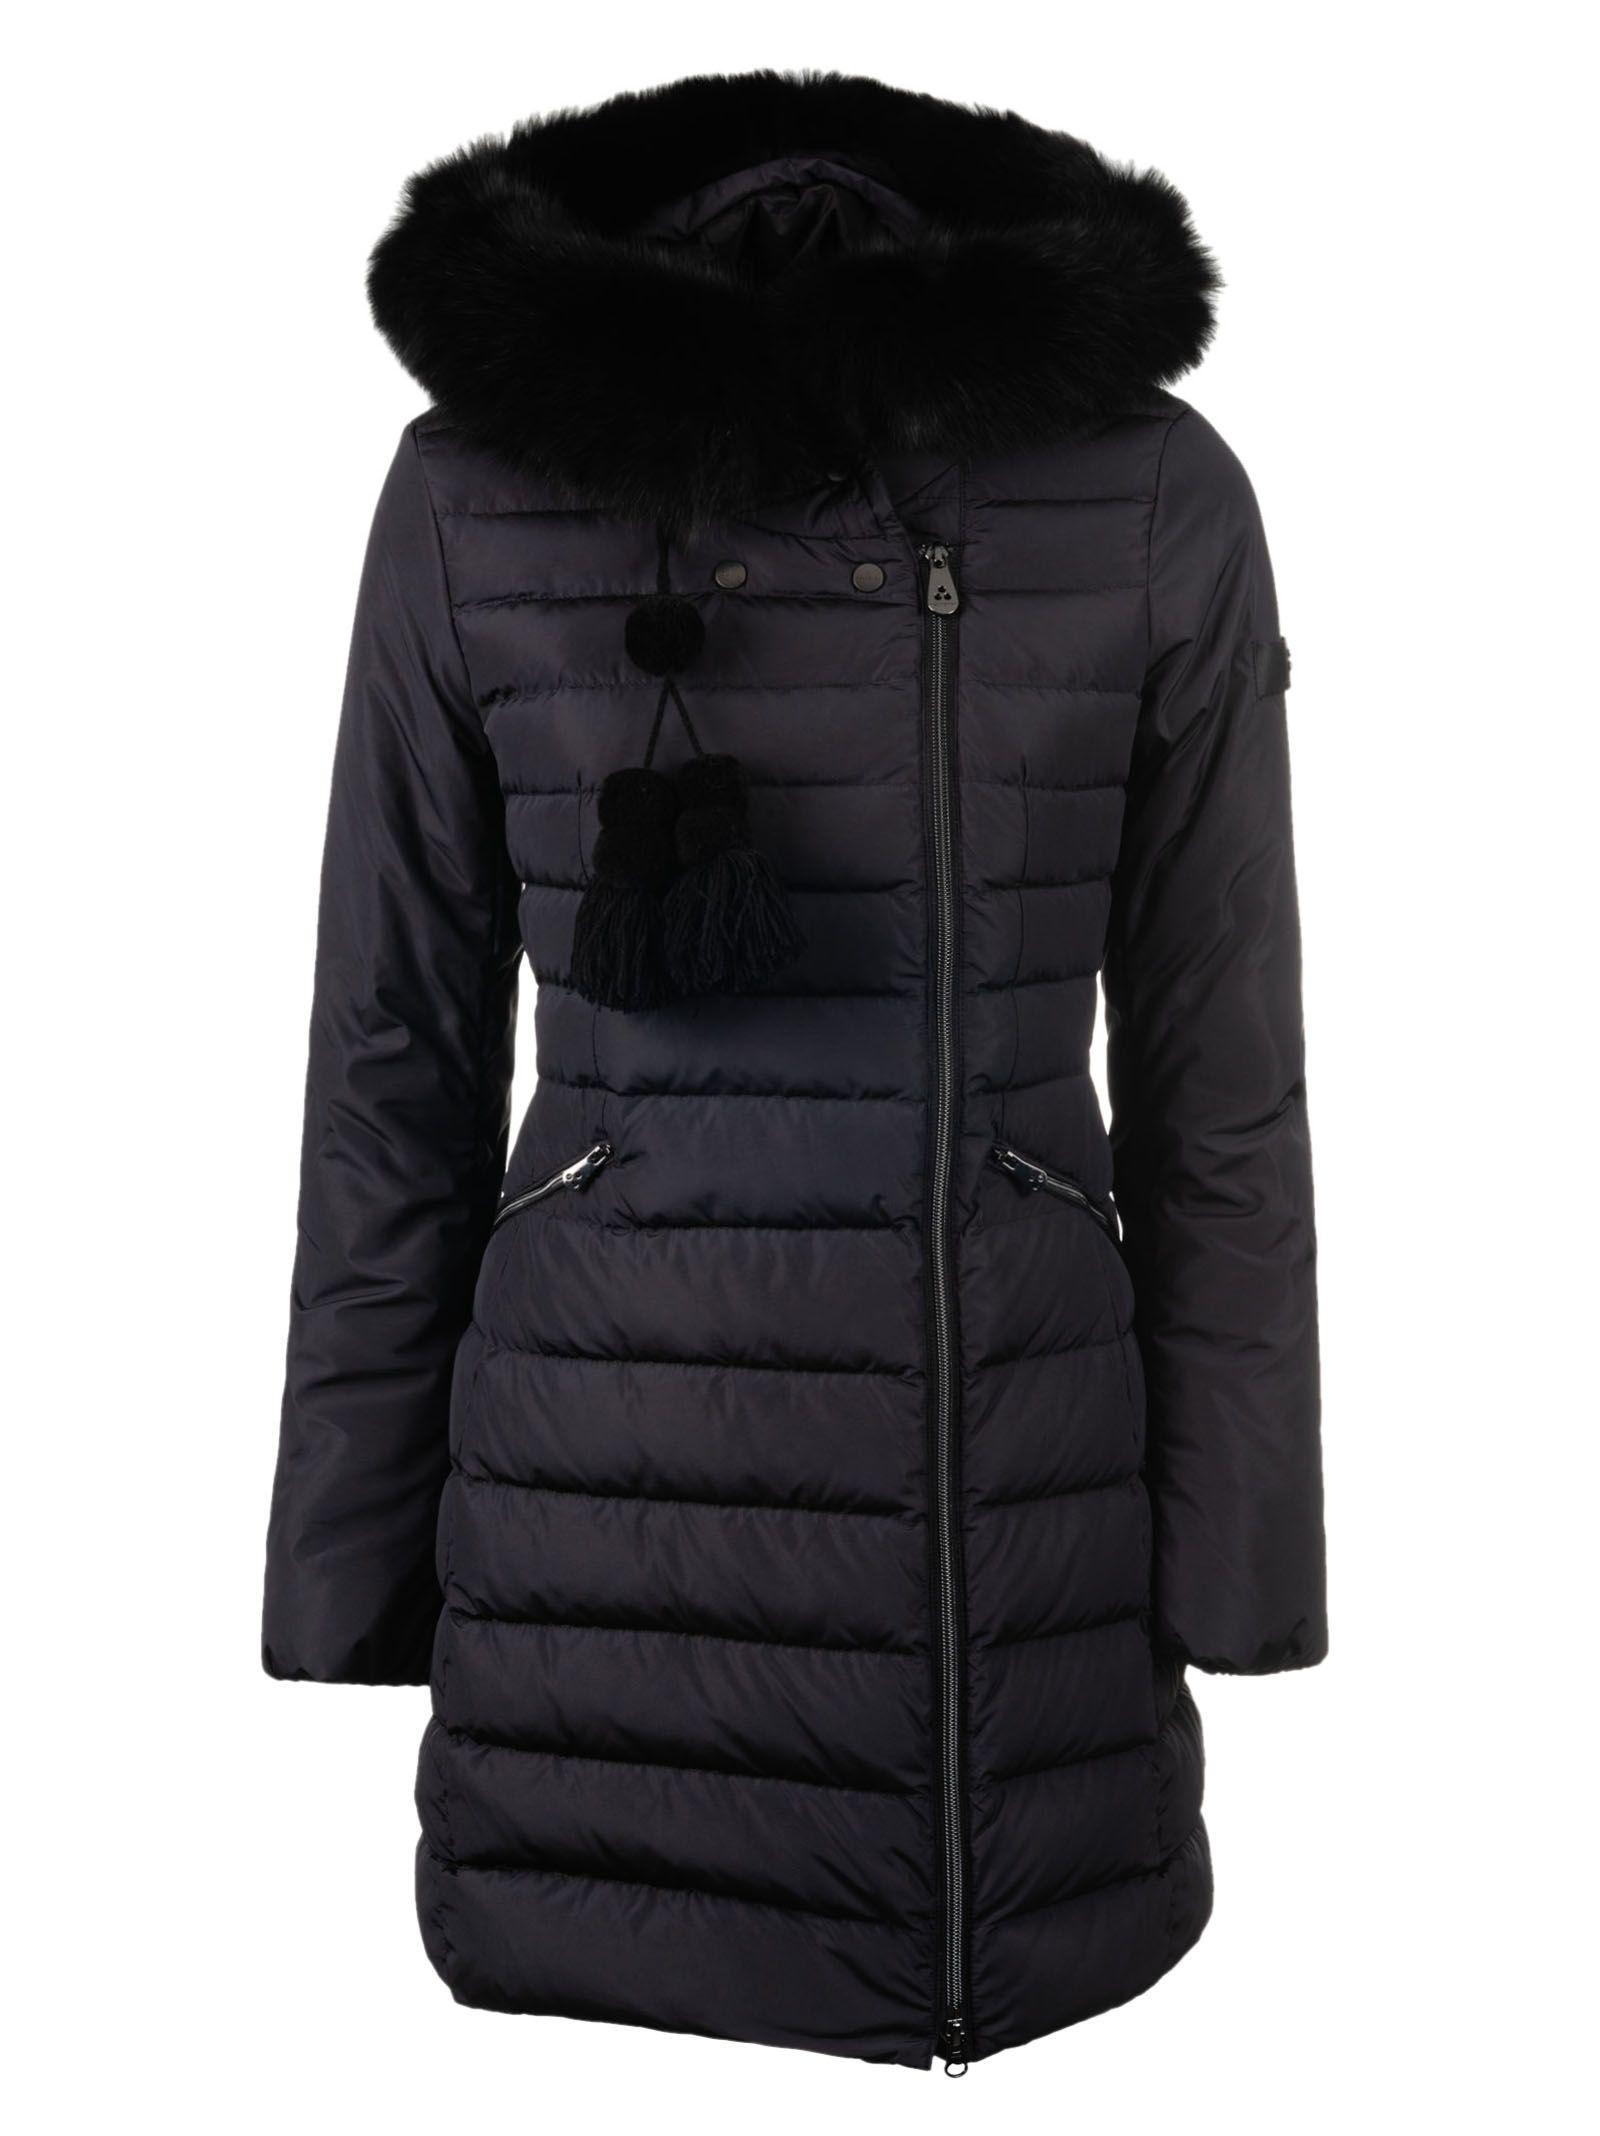 Peuterey Tassel Padded Coat